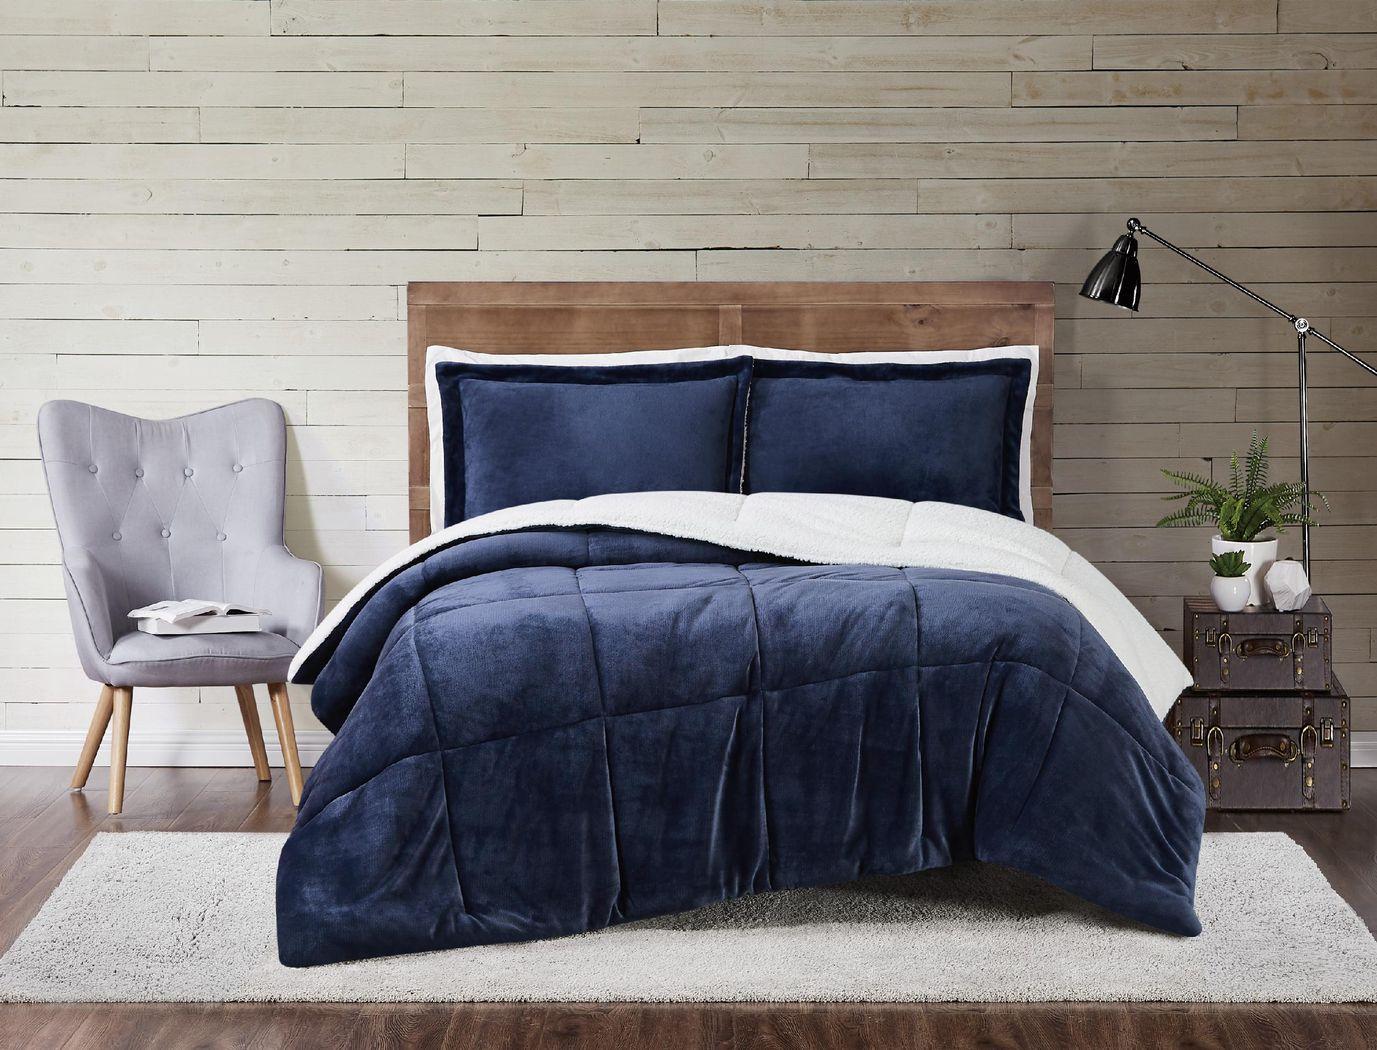 Kids Pebblecreek Indigo 2 Pc Twin Comforter Set